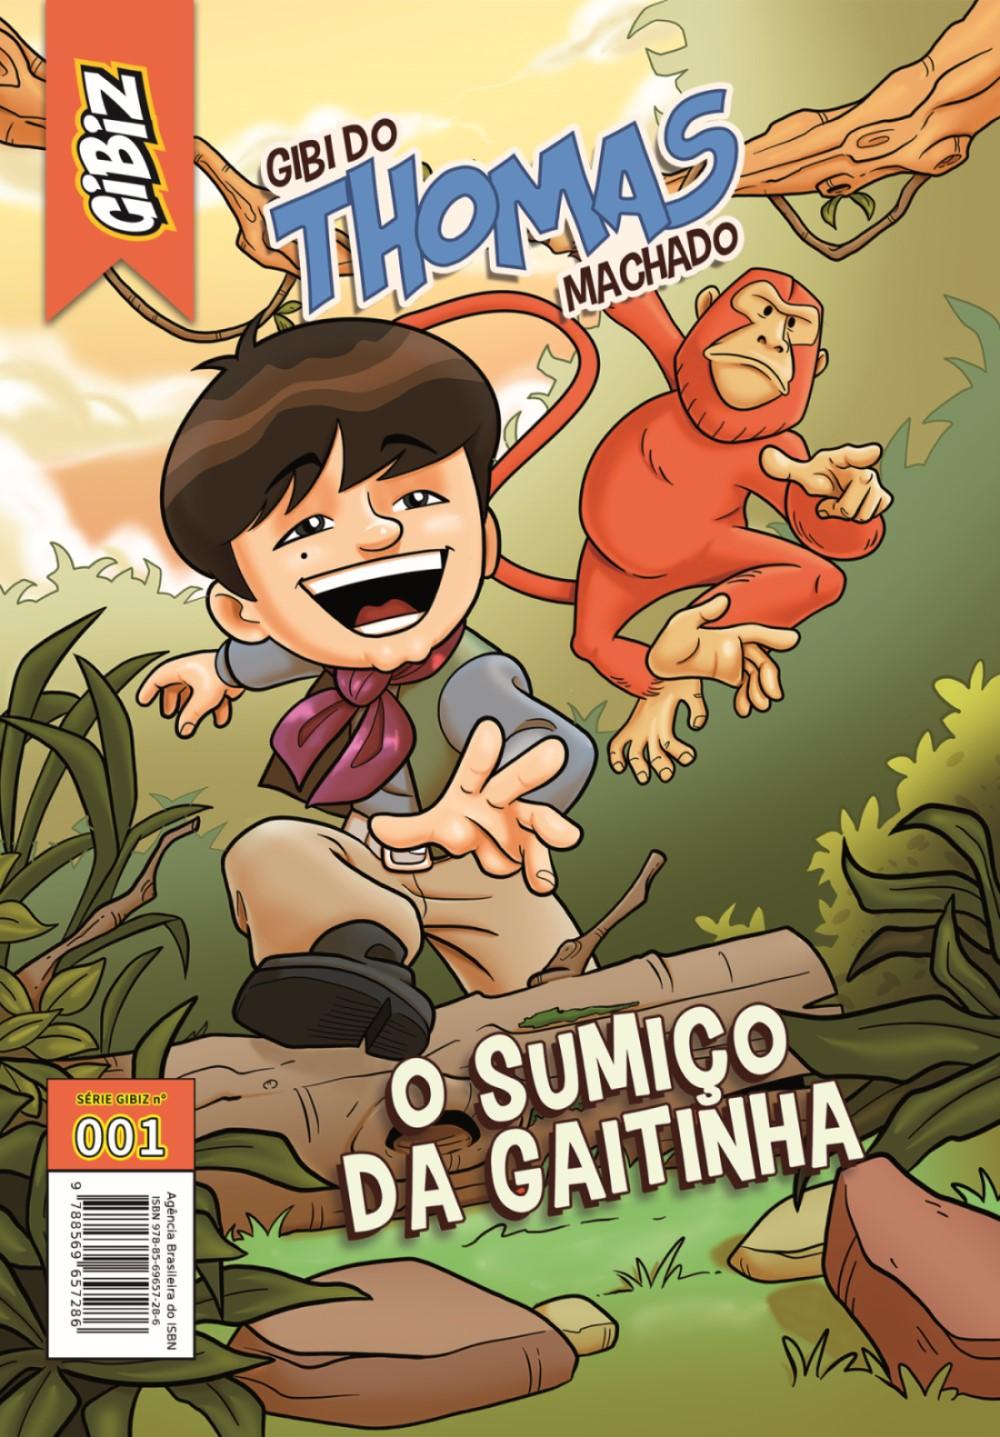 GIBI DO THOMAS MACHADO - O SUMIÇO DA GAITINHA